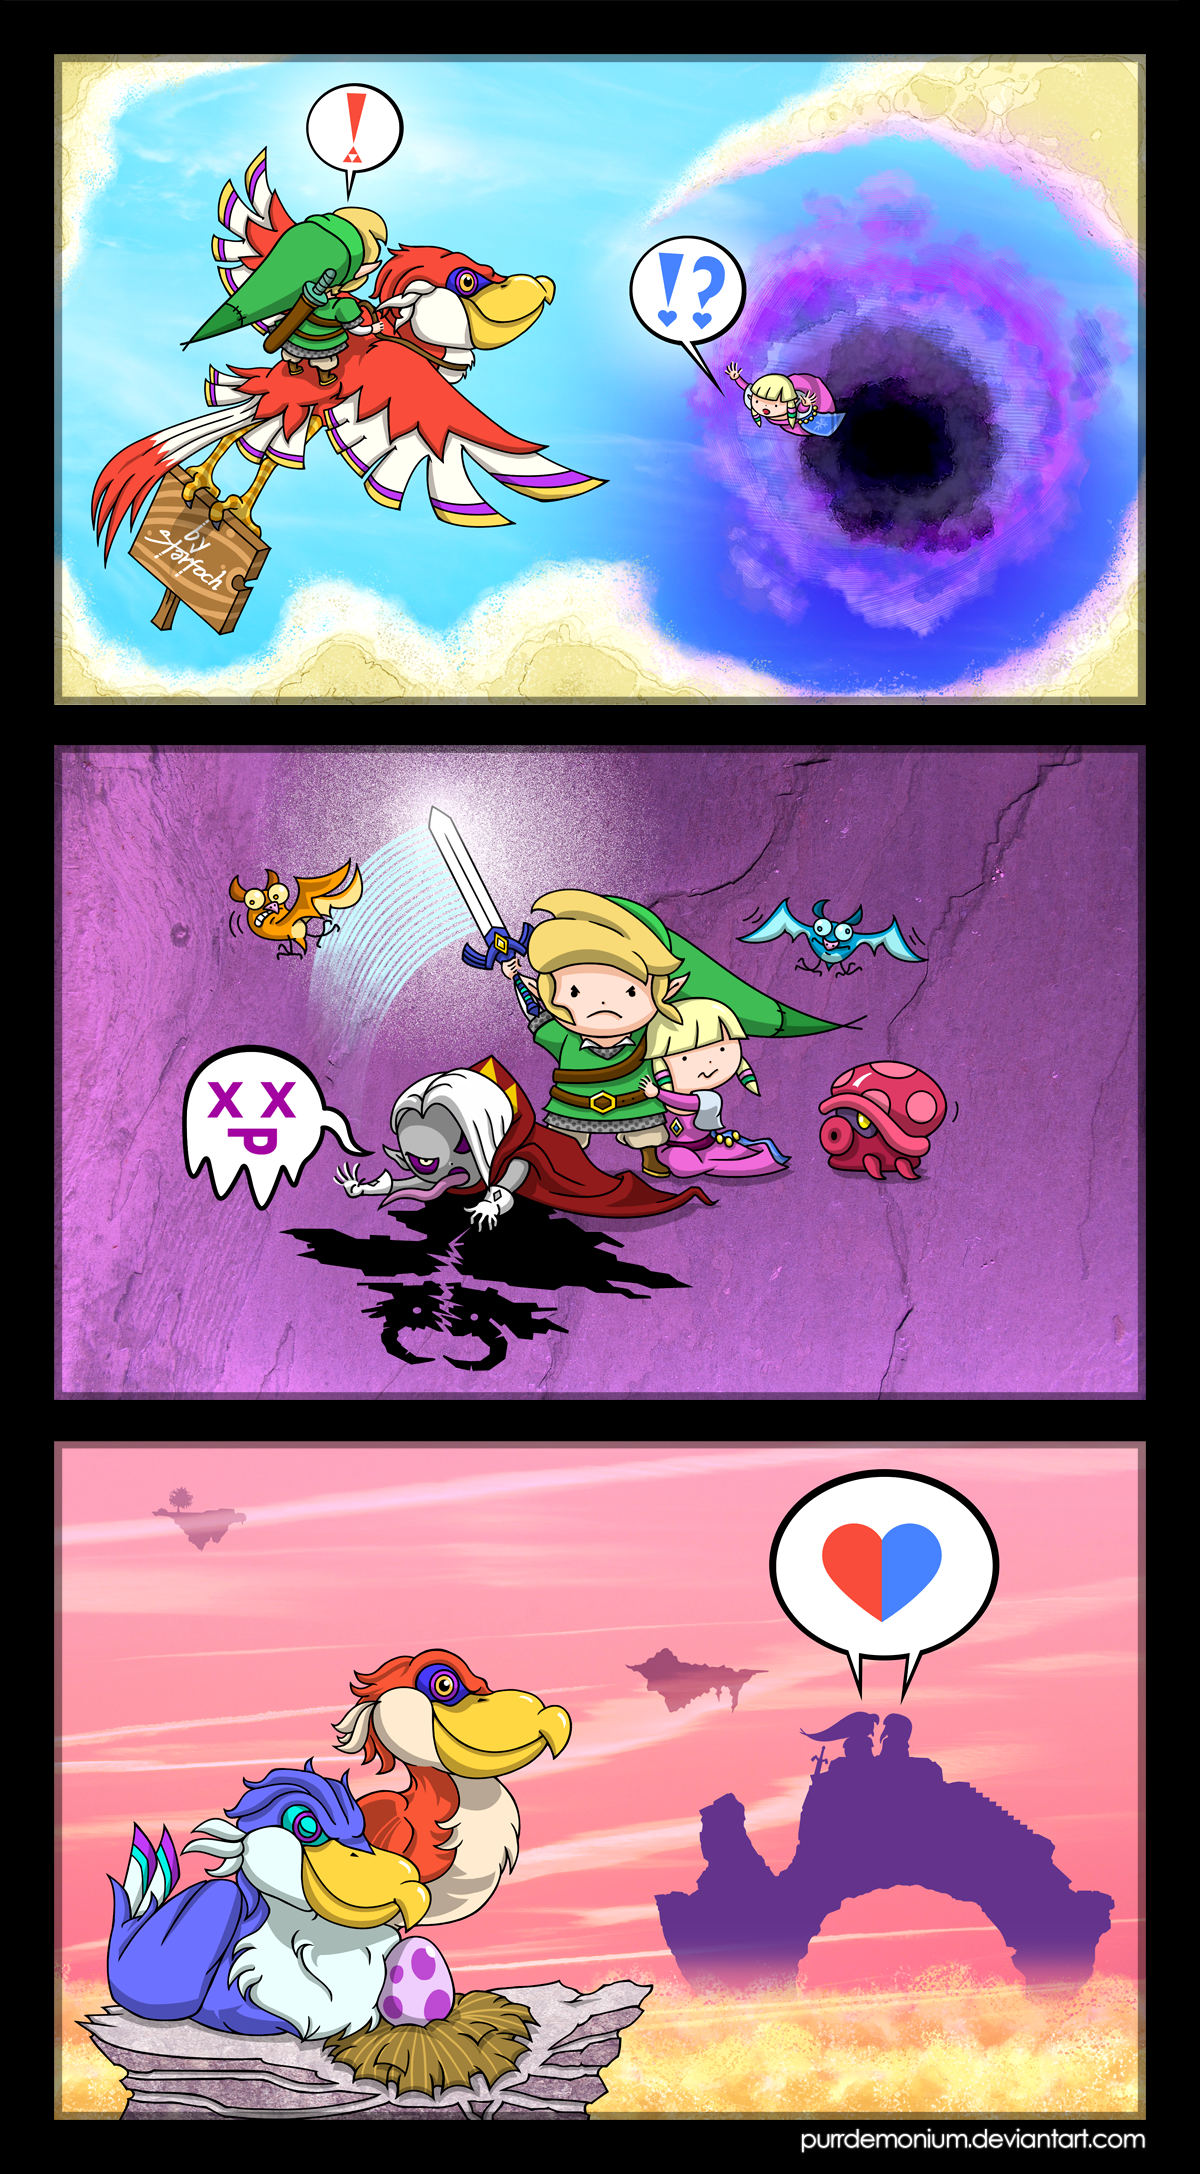 Zelda Skyward Sword Short Comic By Purrdemonium